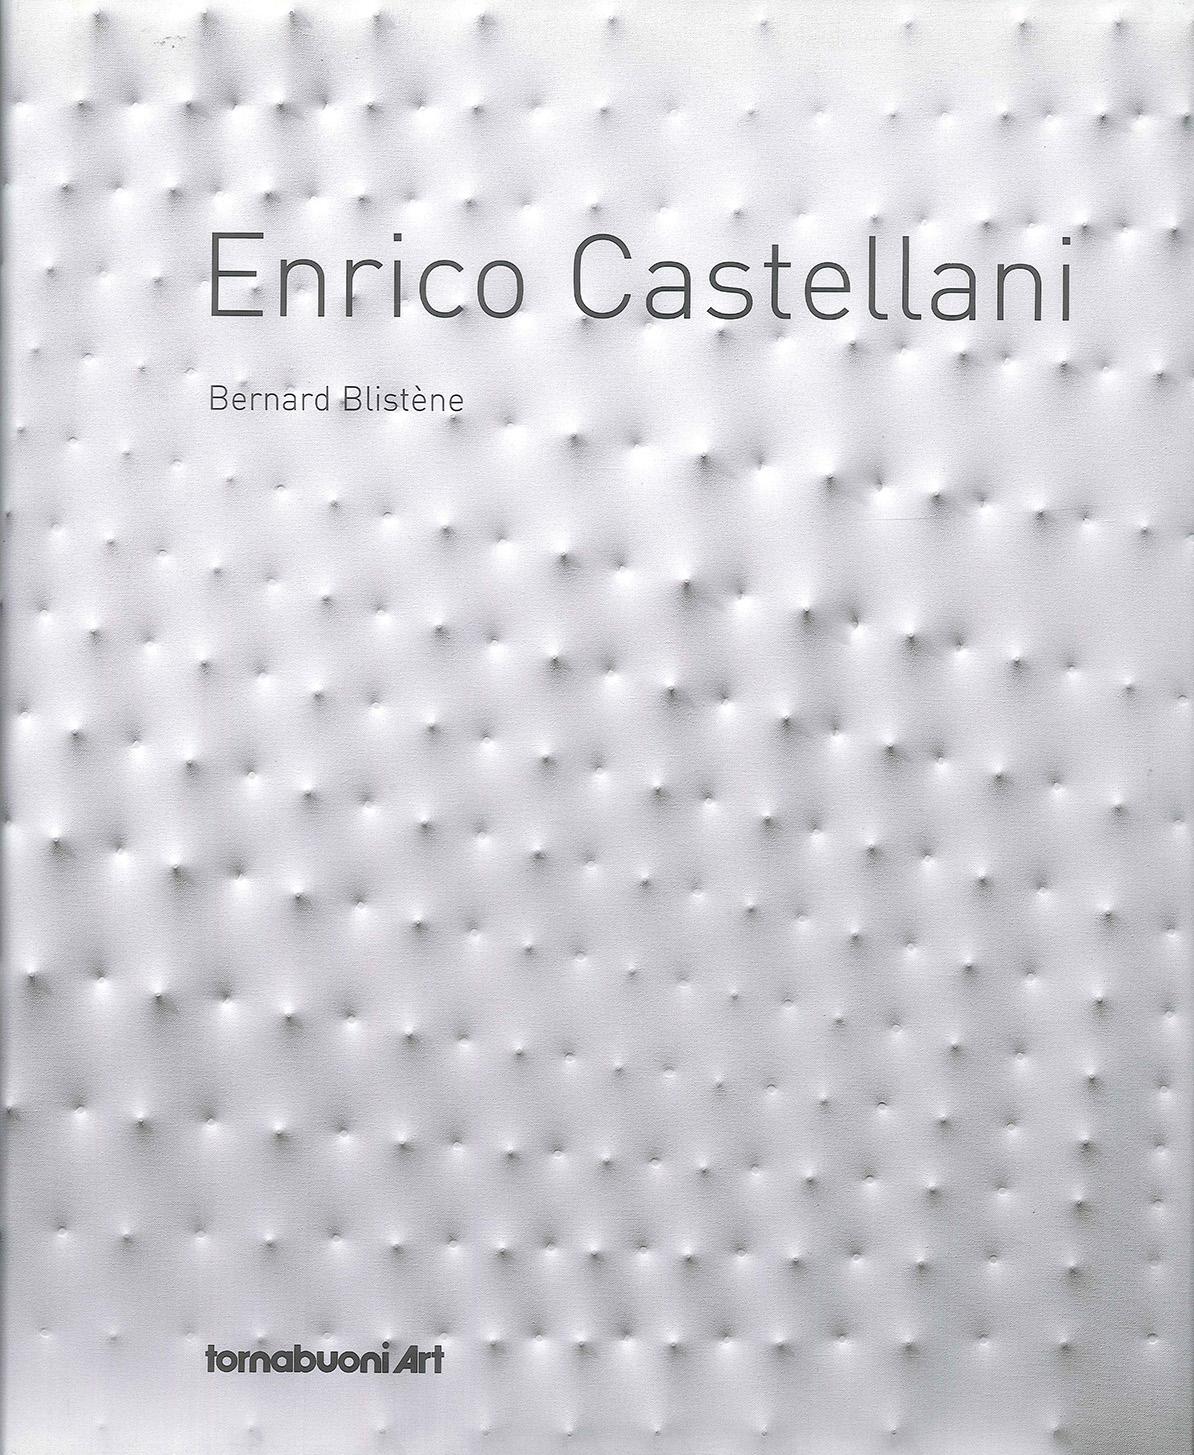 Copertina - Enrico Castellani, Bernard Blistène, 2011, Tornabuoni Art, Parigi (FRA), Forma Edizioni